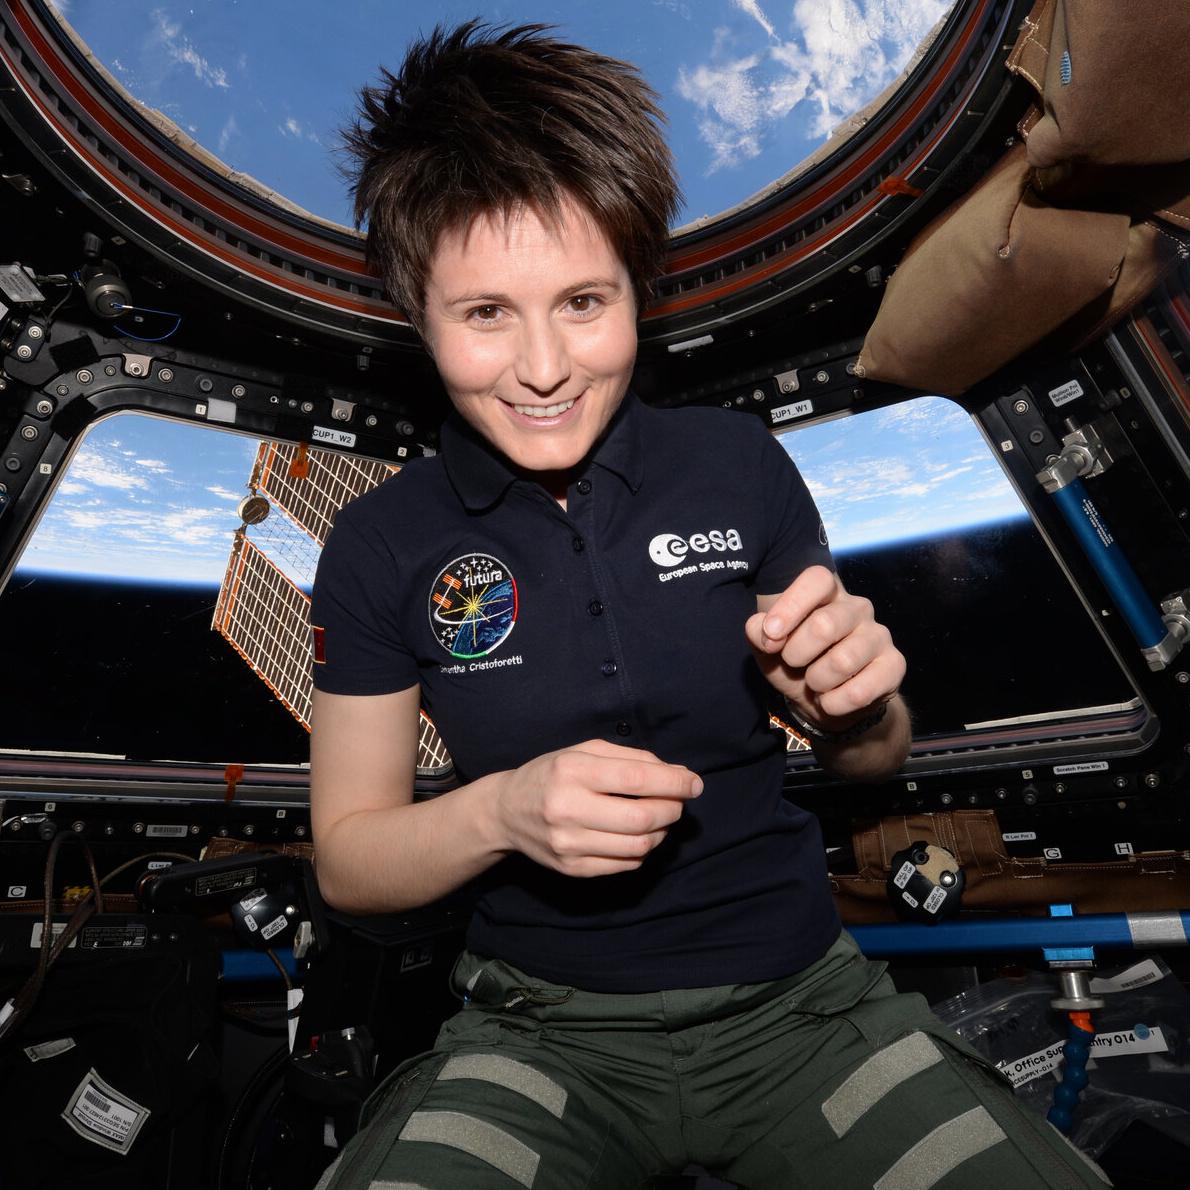 Samantha_Cristoforetti_onboard_the_International_Space_Station_pillars